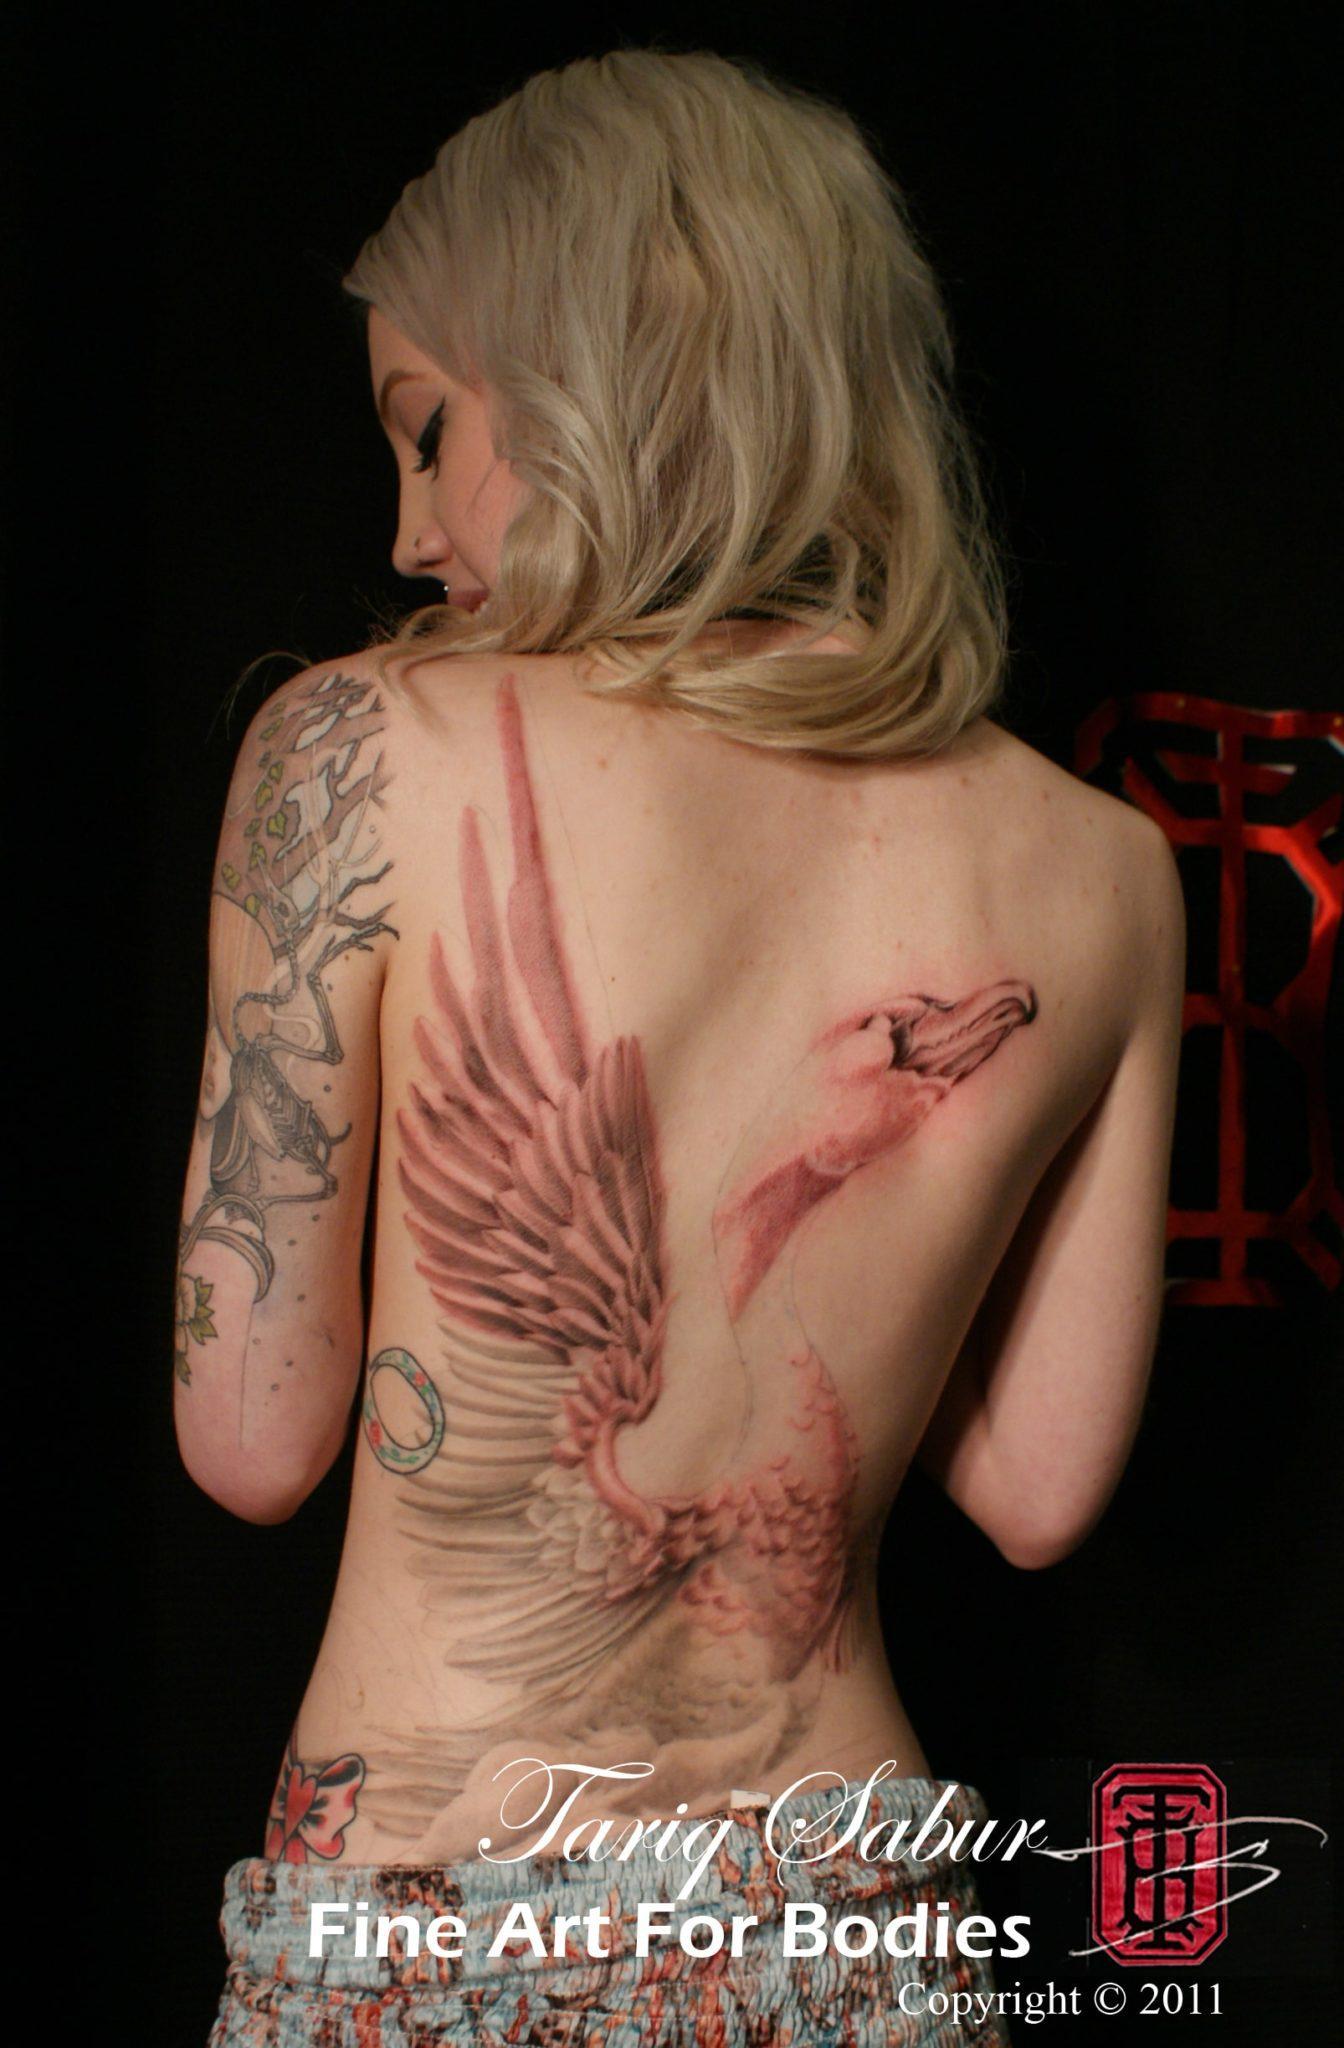 Tariq Sabur Tempe Tattoo artist fine art for bodies swan black and grey female backpiece tattoo crane female nude SIG-DSC06701